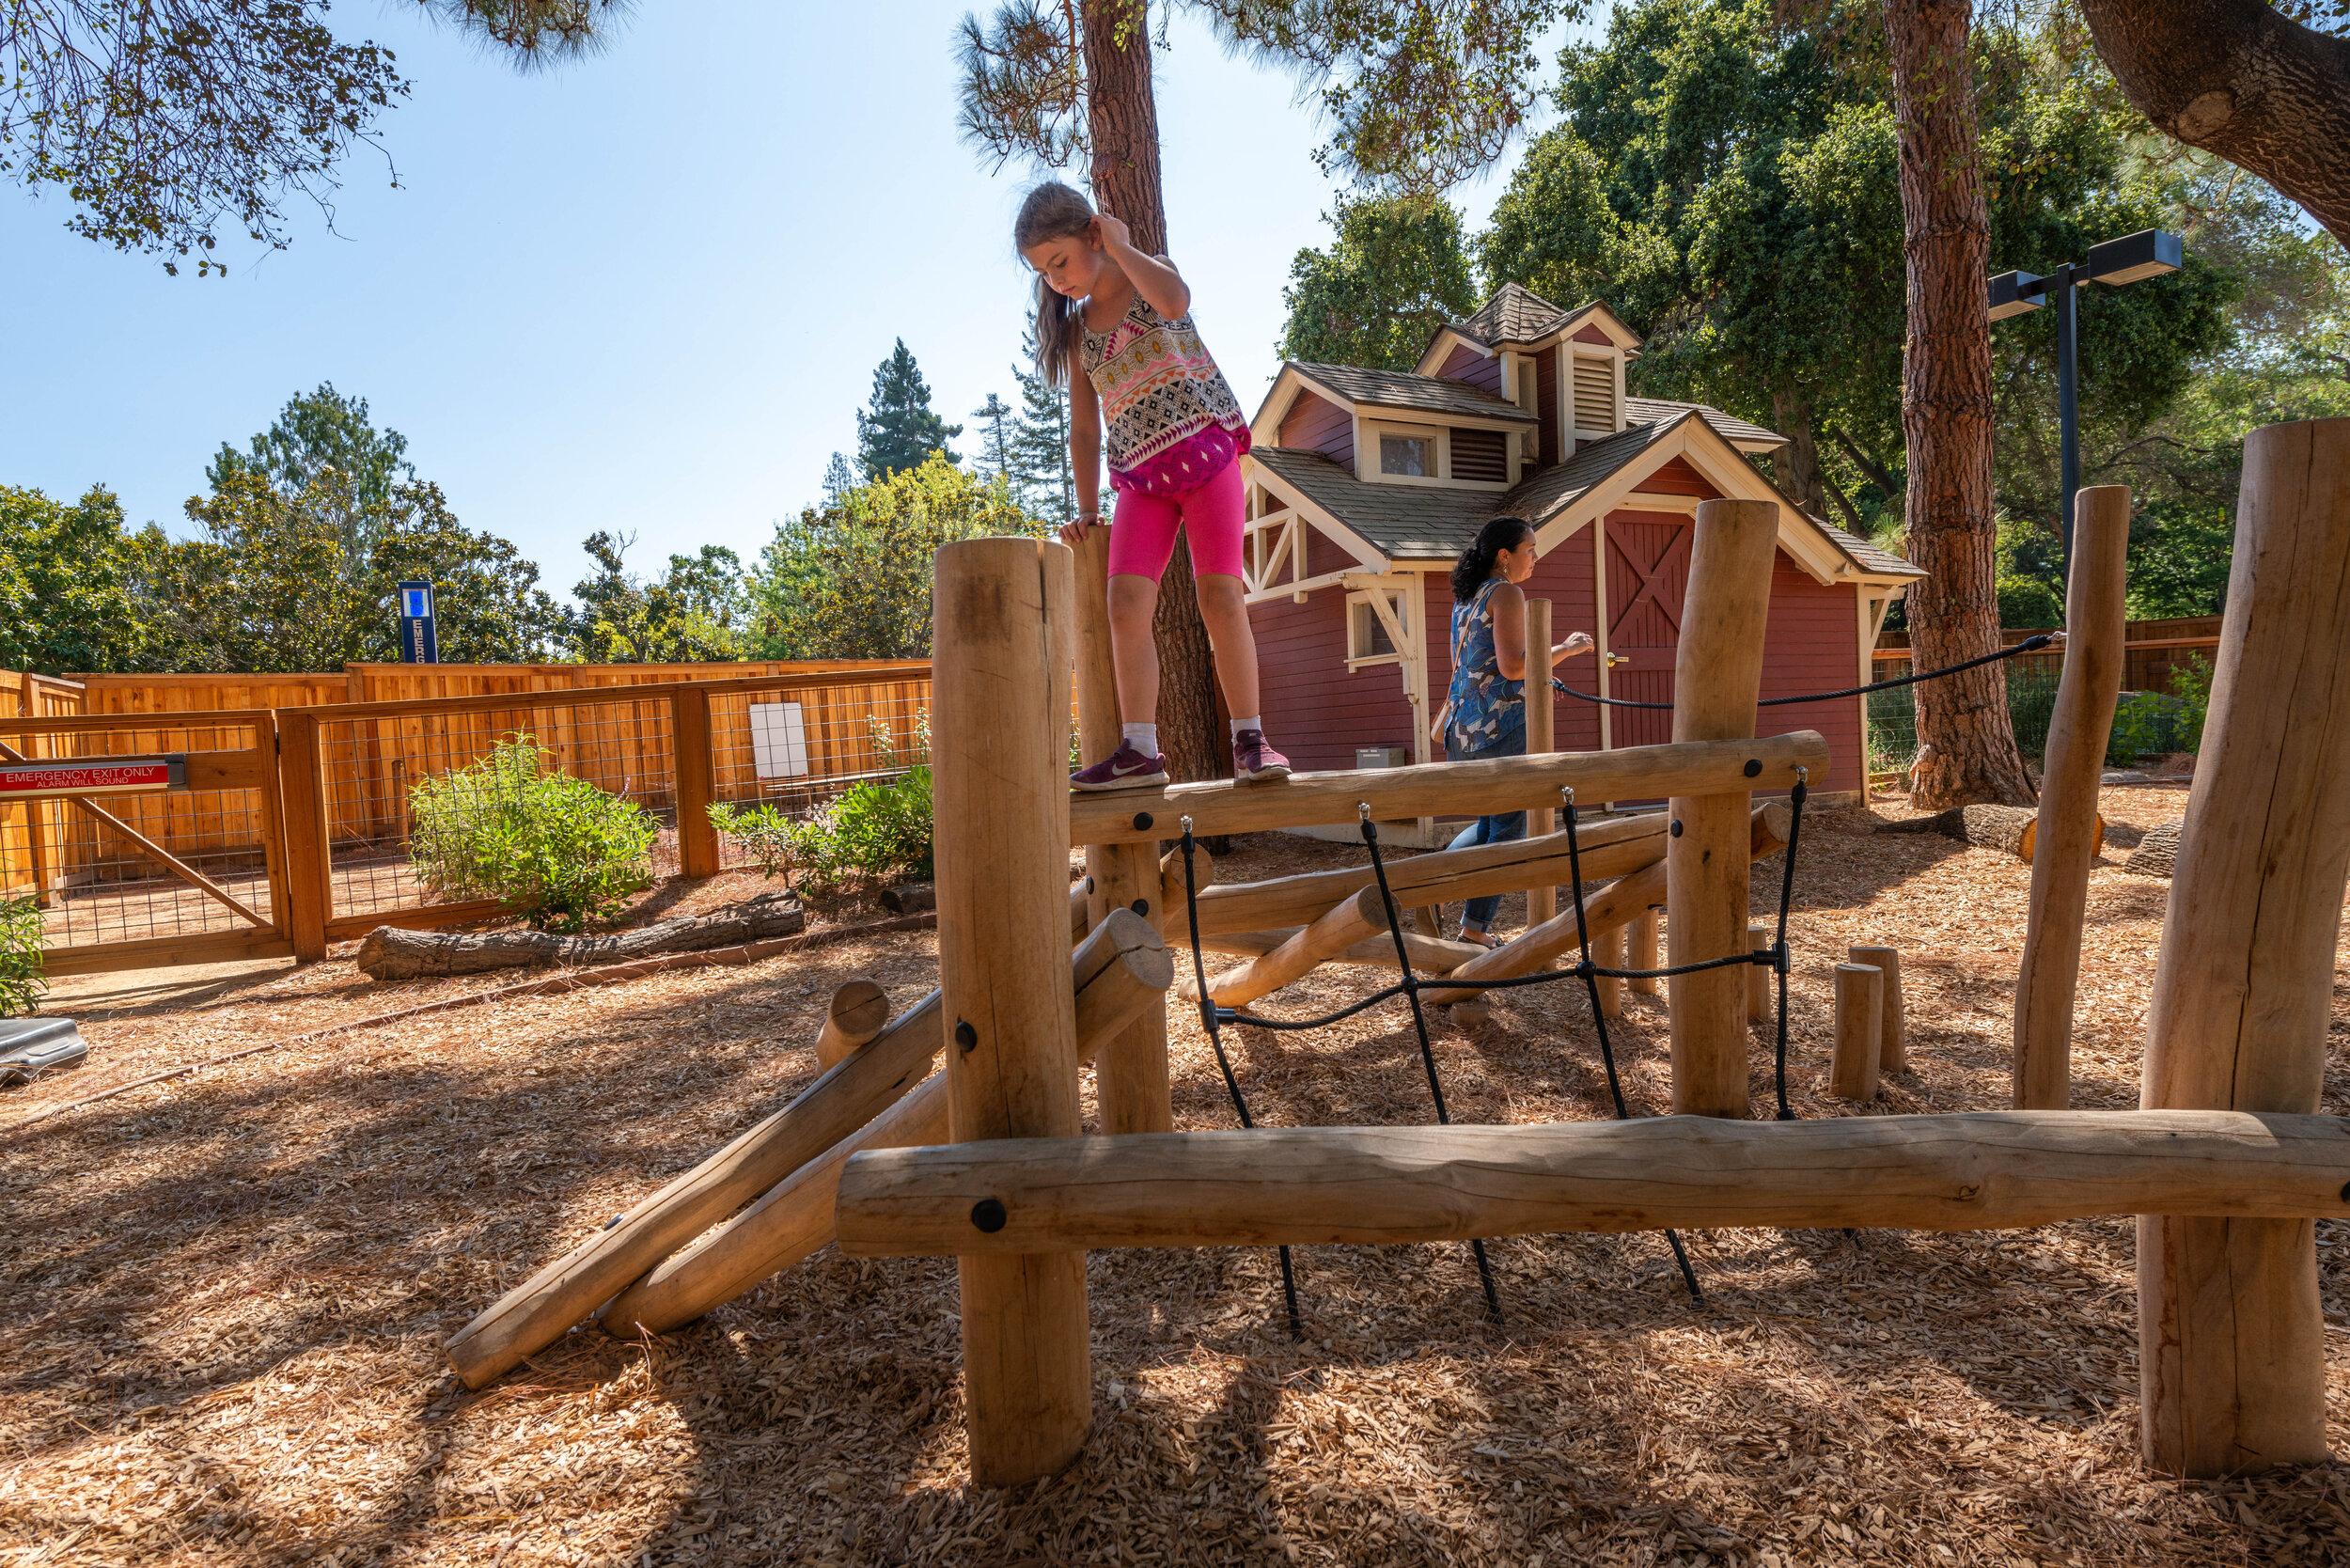 Childrens_Center_of_Stanford_Community_Preschool-27_lo.jpg